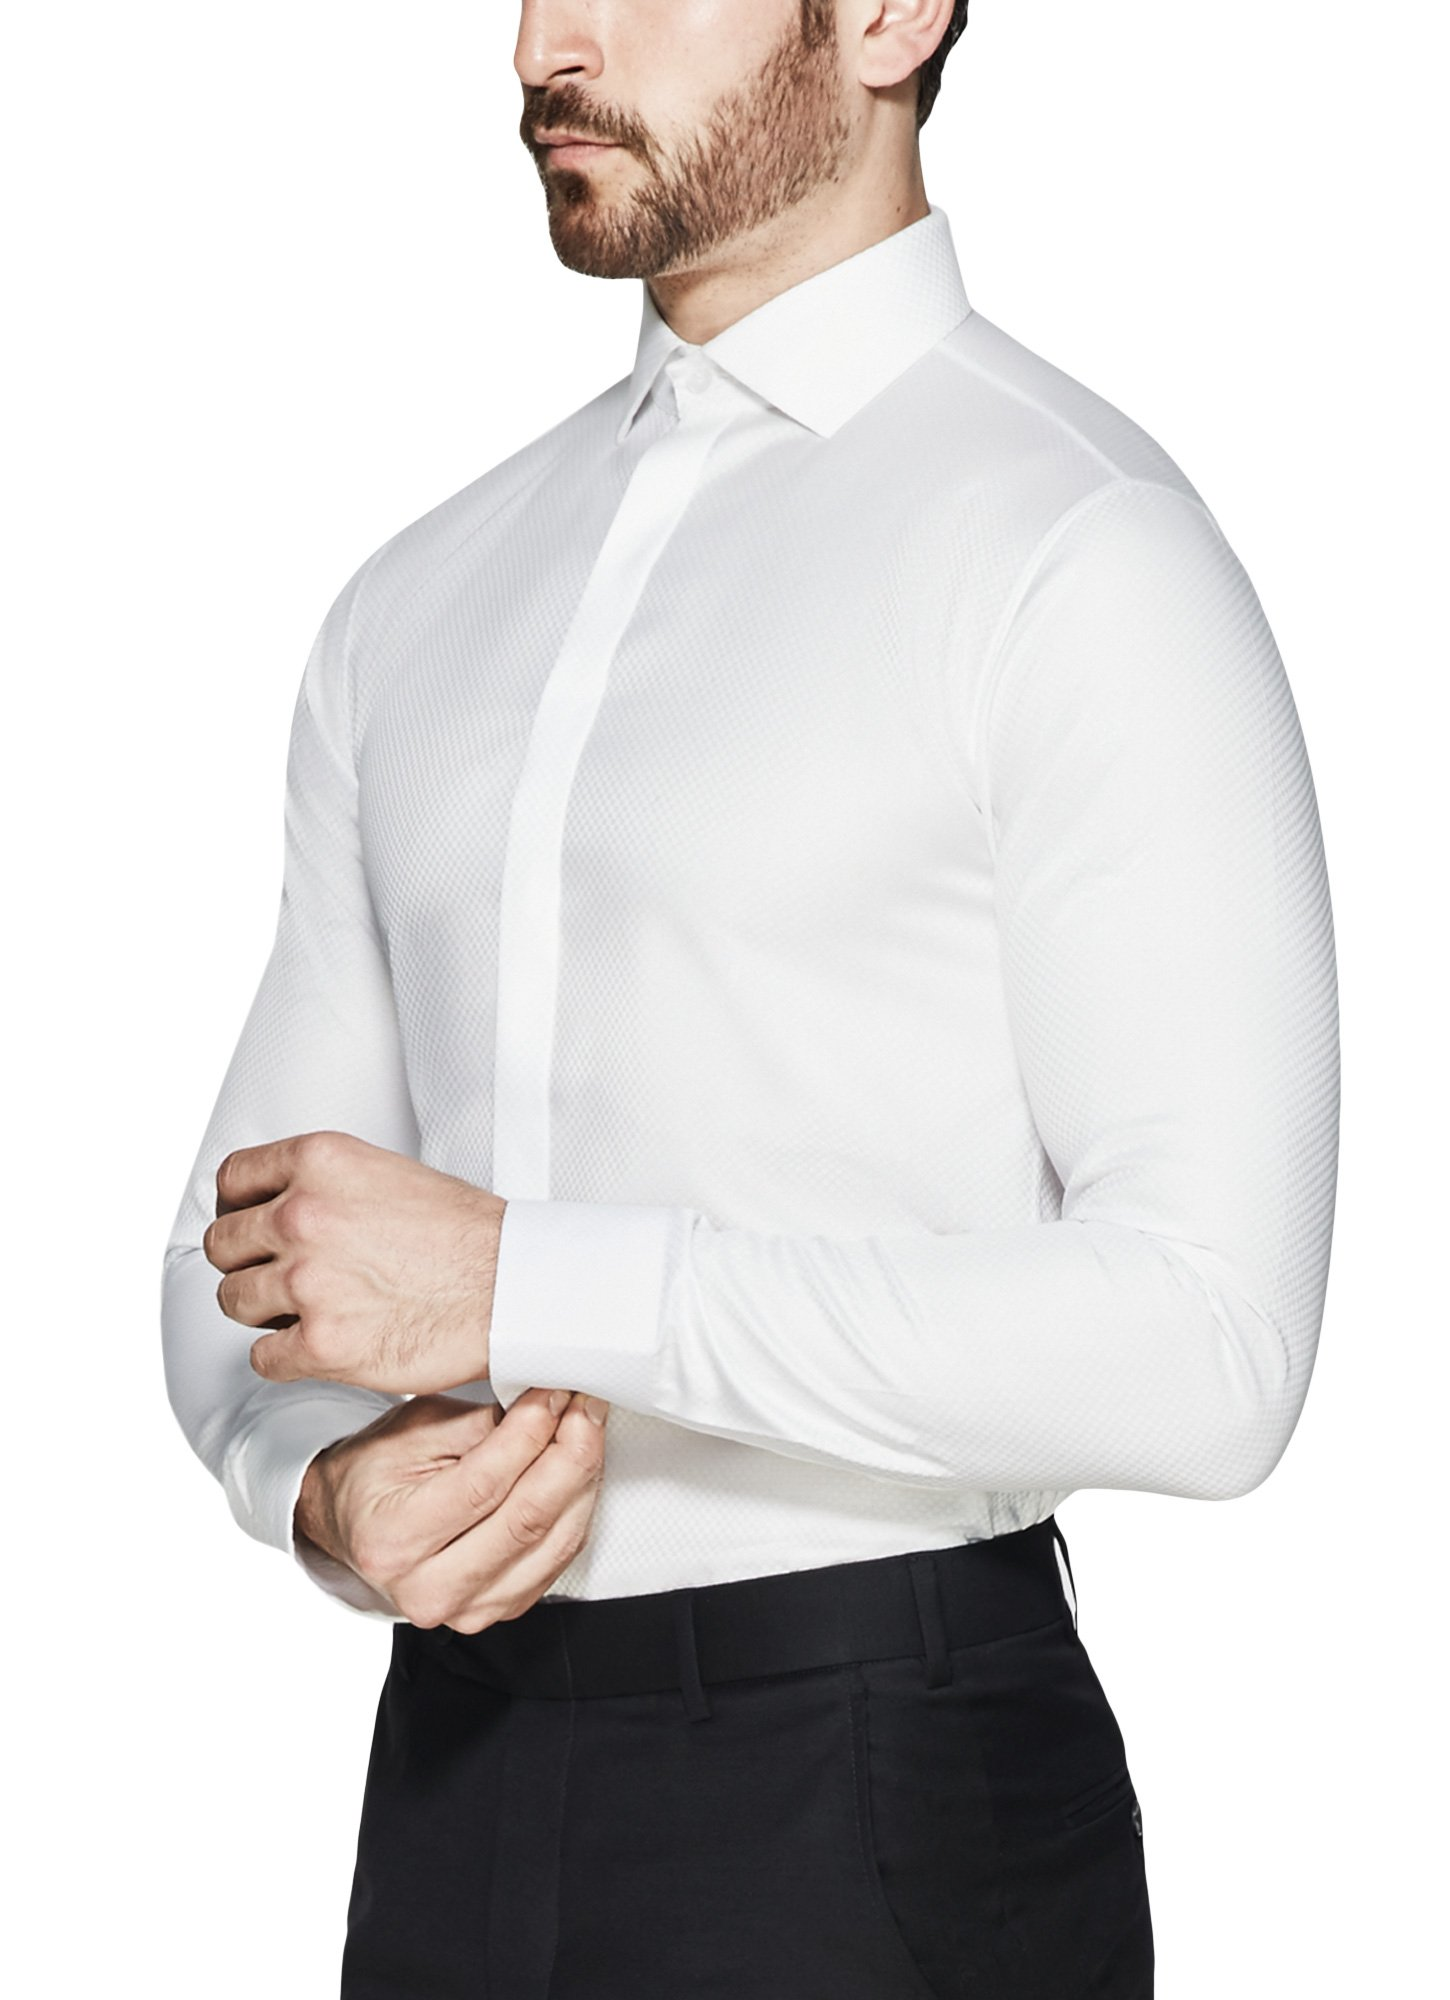 Vardama Men's Tuxedo White Shirt With Stain Proof Technology Columbus (Medium)